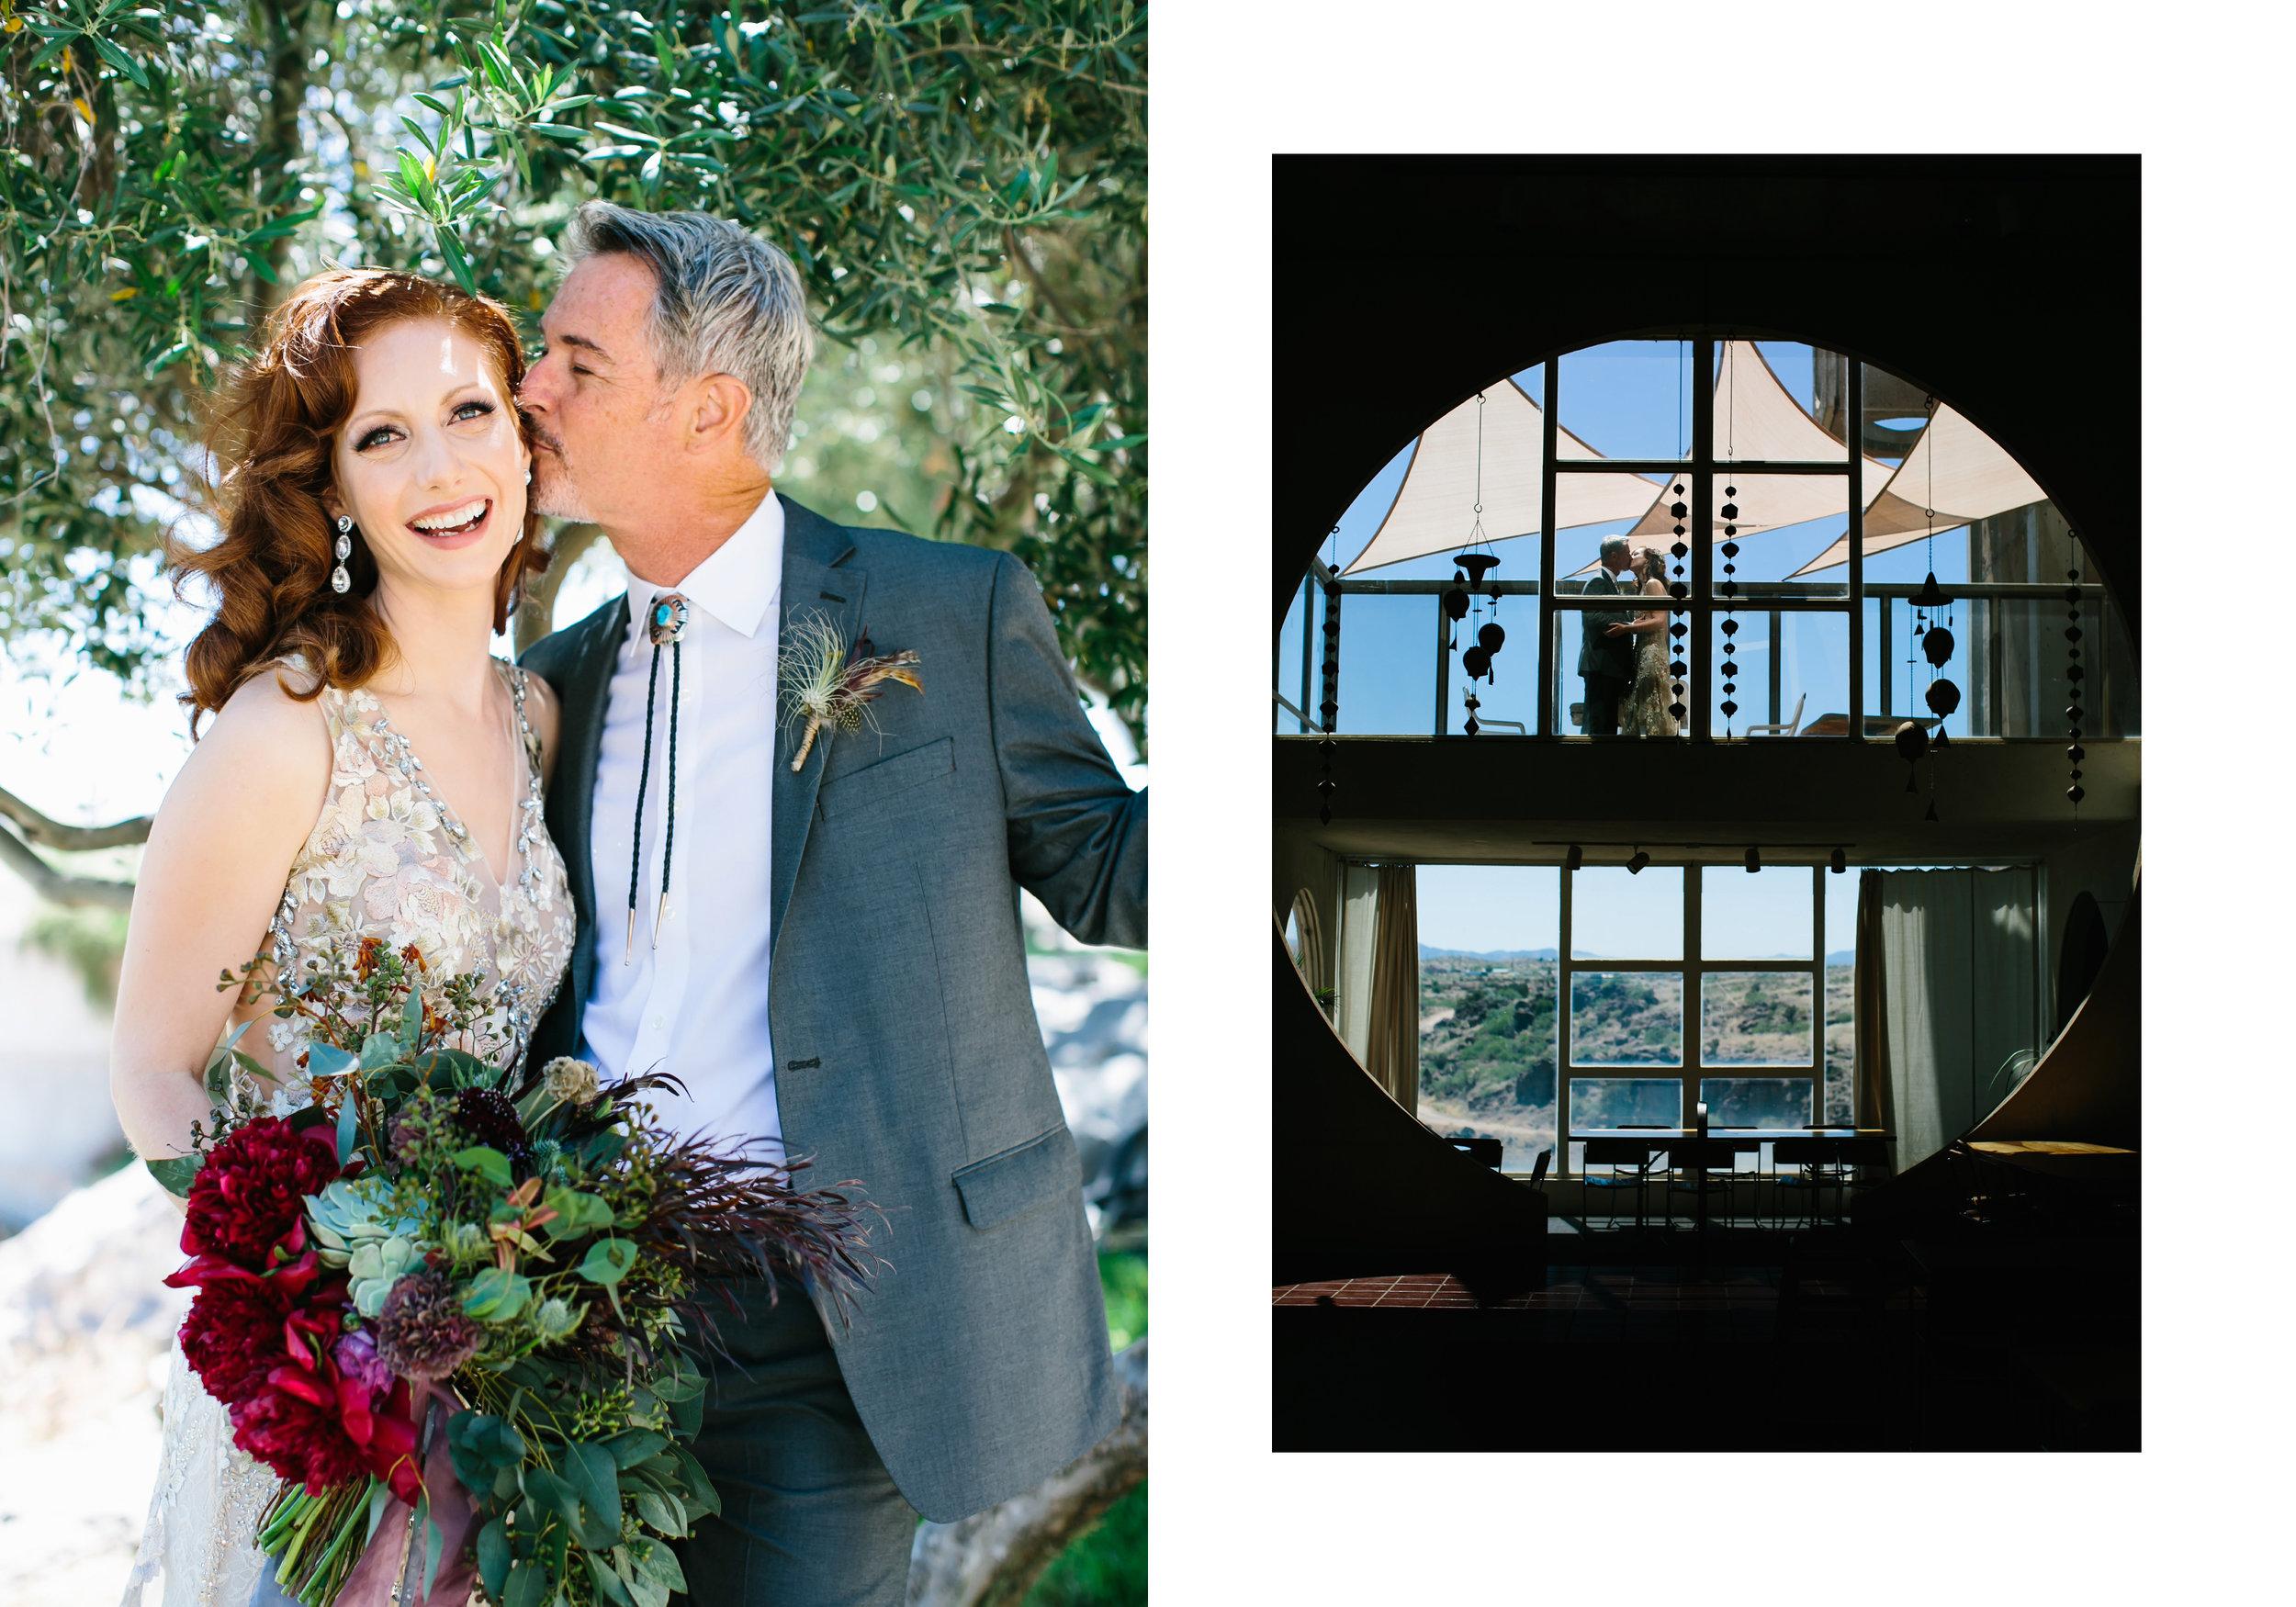 arcosanti-wedding-photography0010.JPG